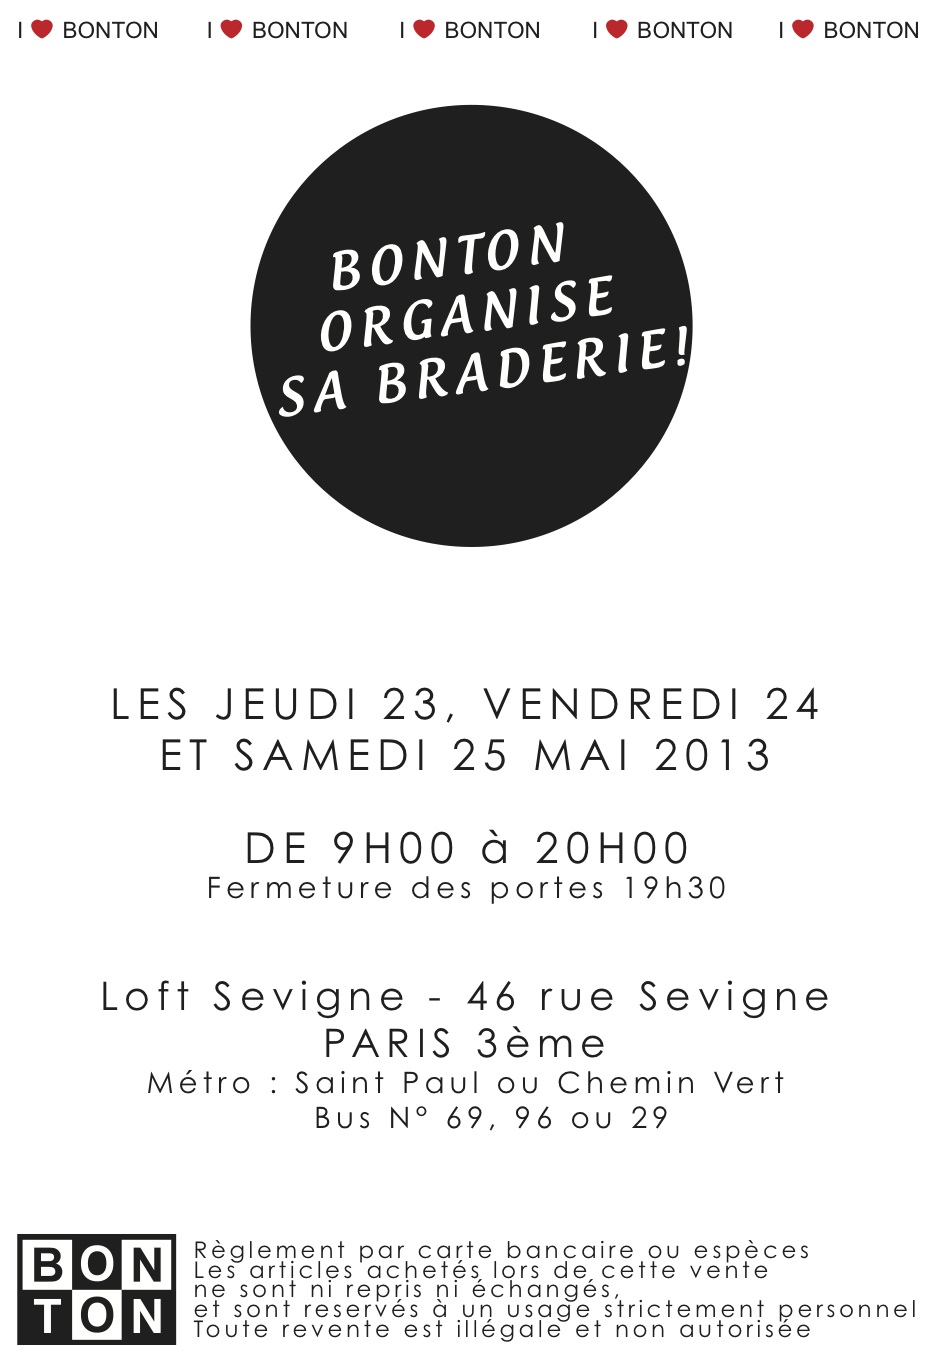 Braderie Bonton Paris